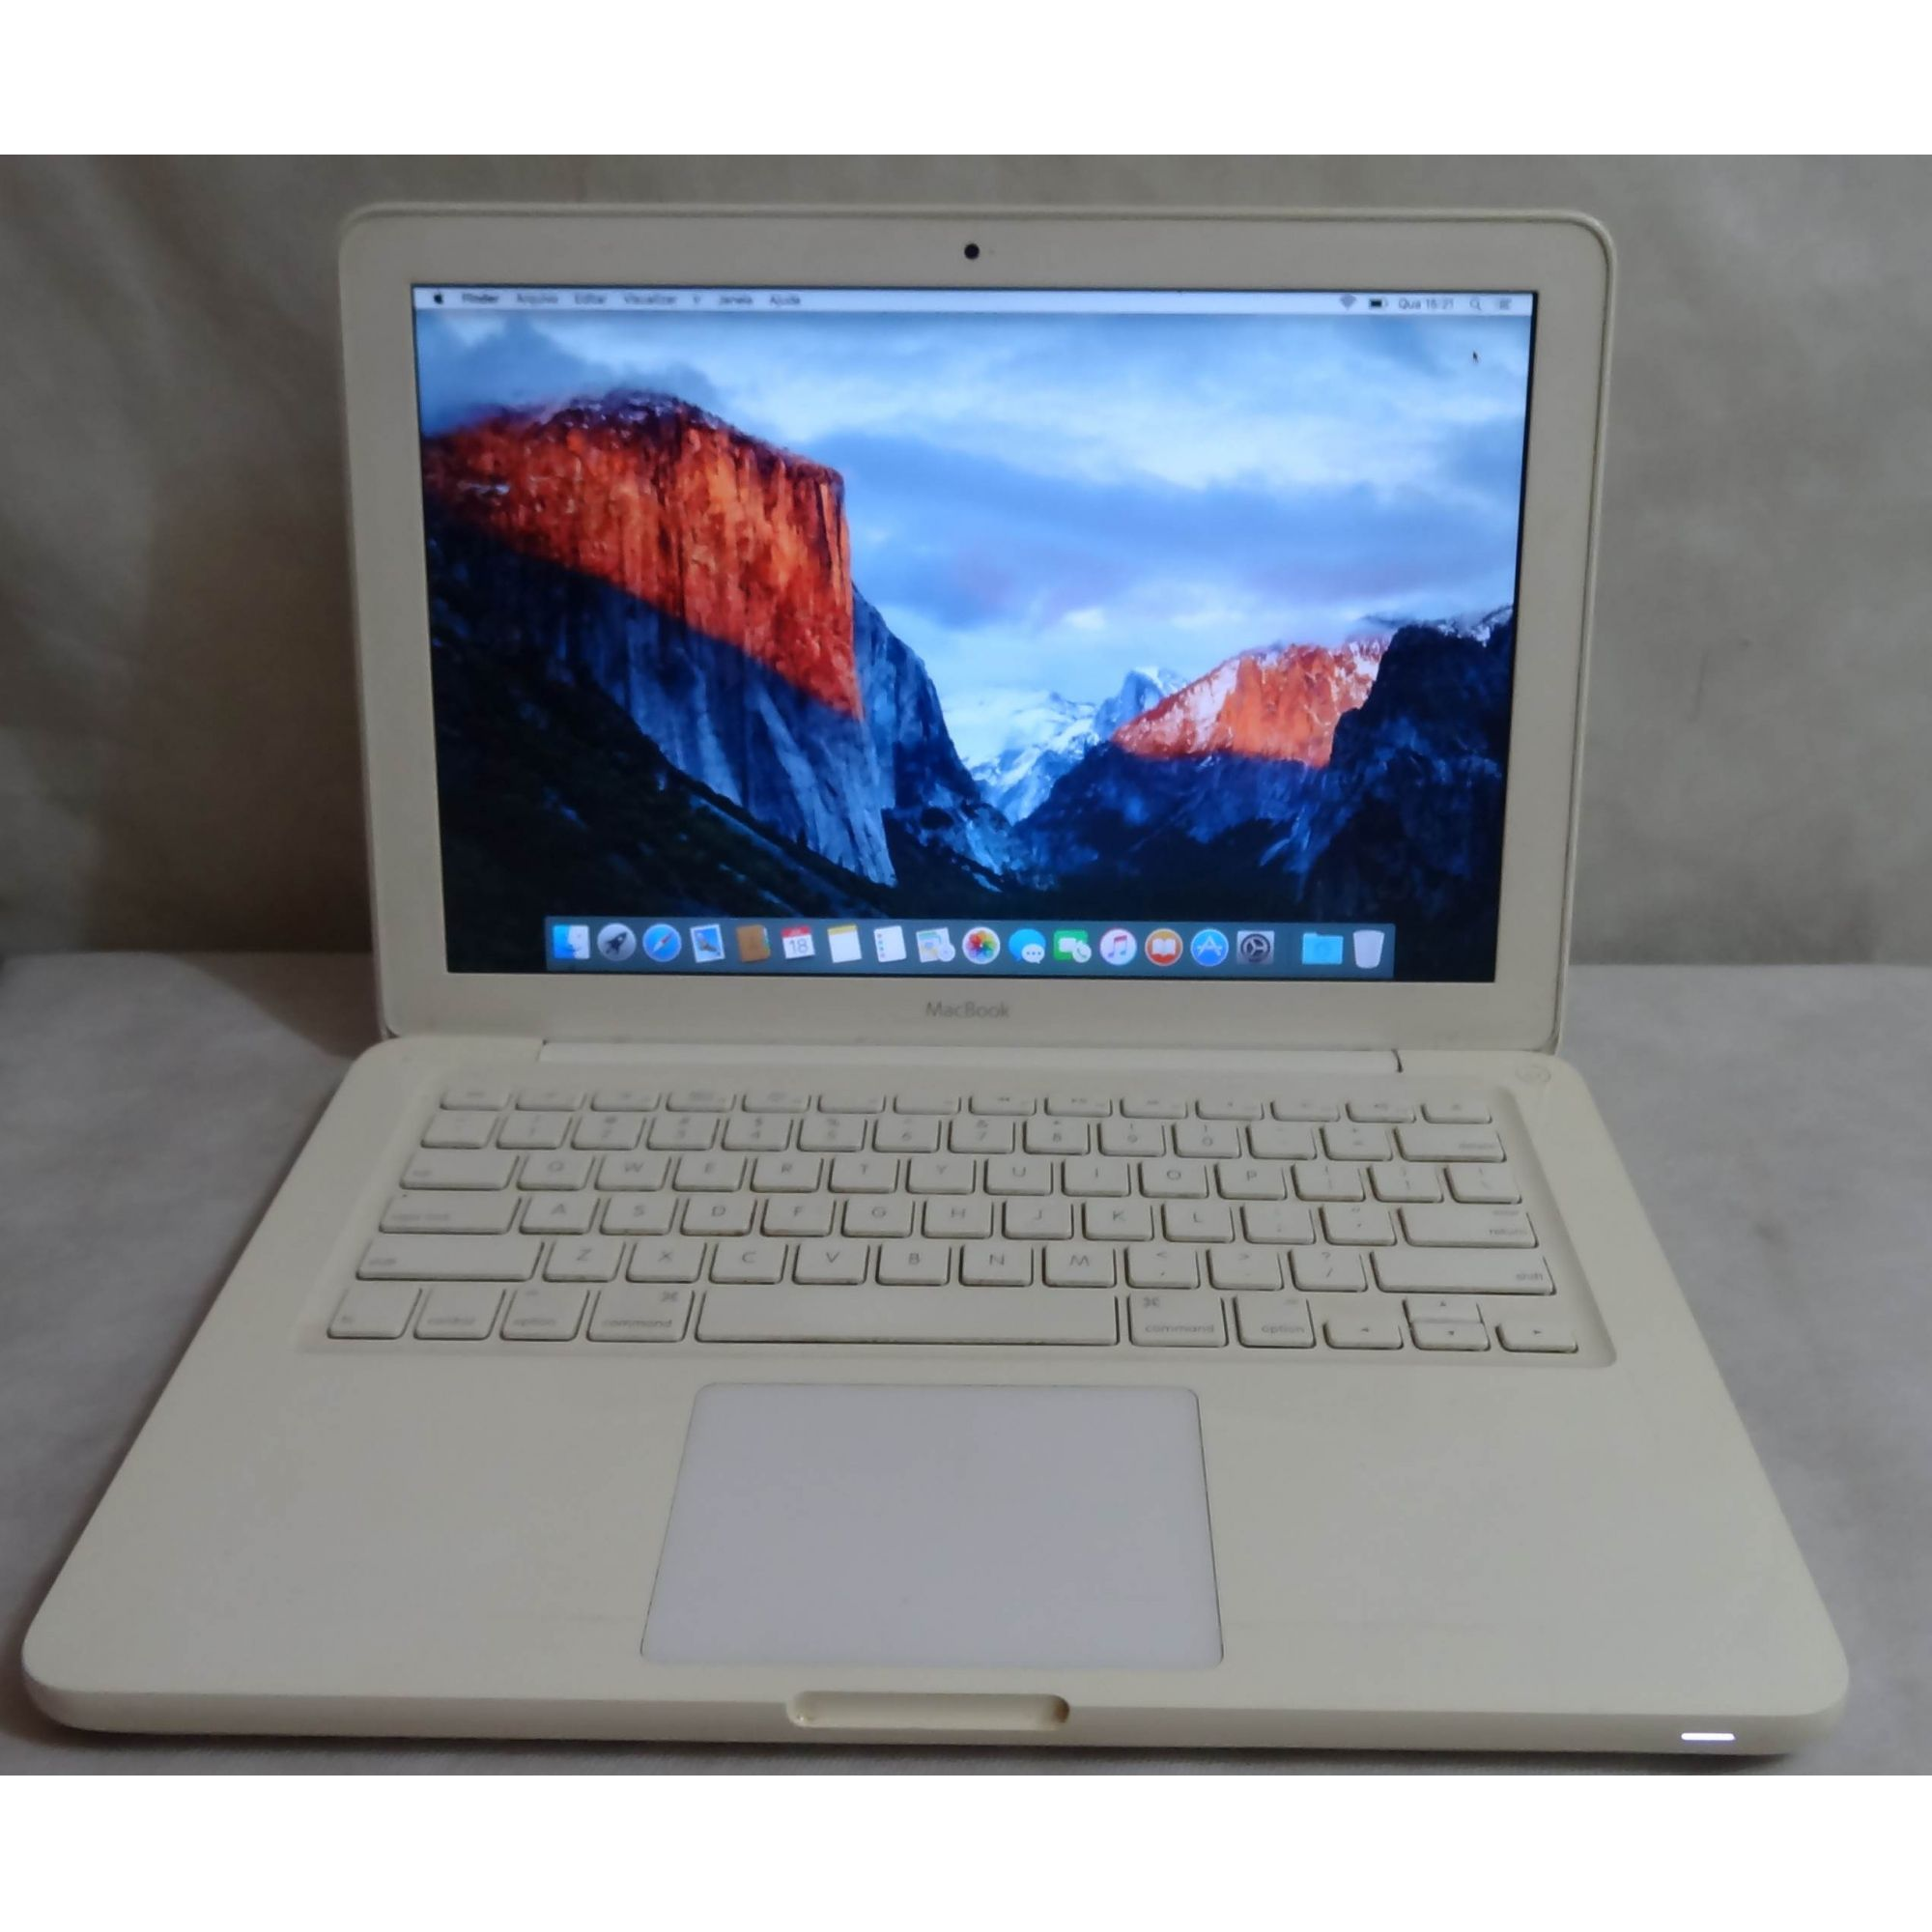 "MacBook White MC516LL/A 13.3"" Intel Core 2 Duo 2.4GHz 4GB 250GB HD"